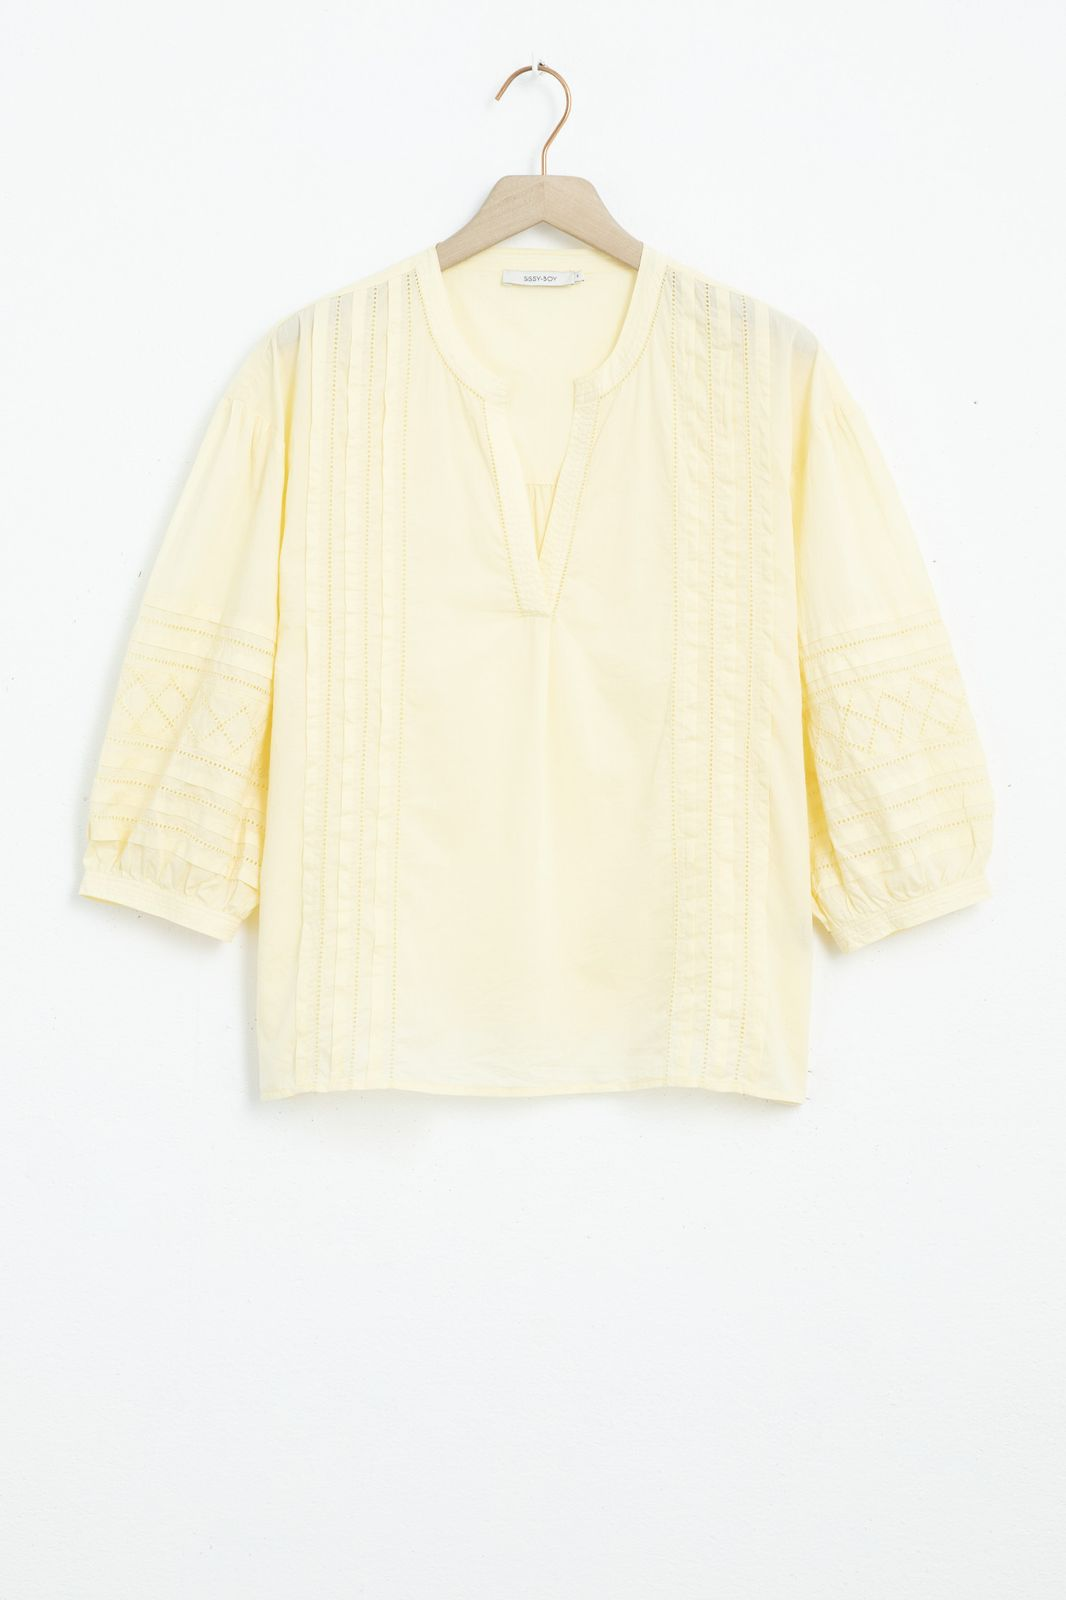 Lichtgele blouse met geborduurde details en driekwart ballonmouwen - Dames | Sissy-Boy